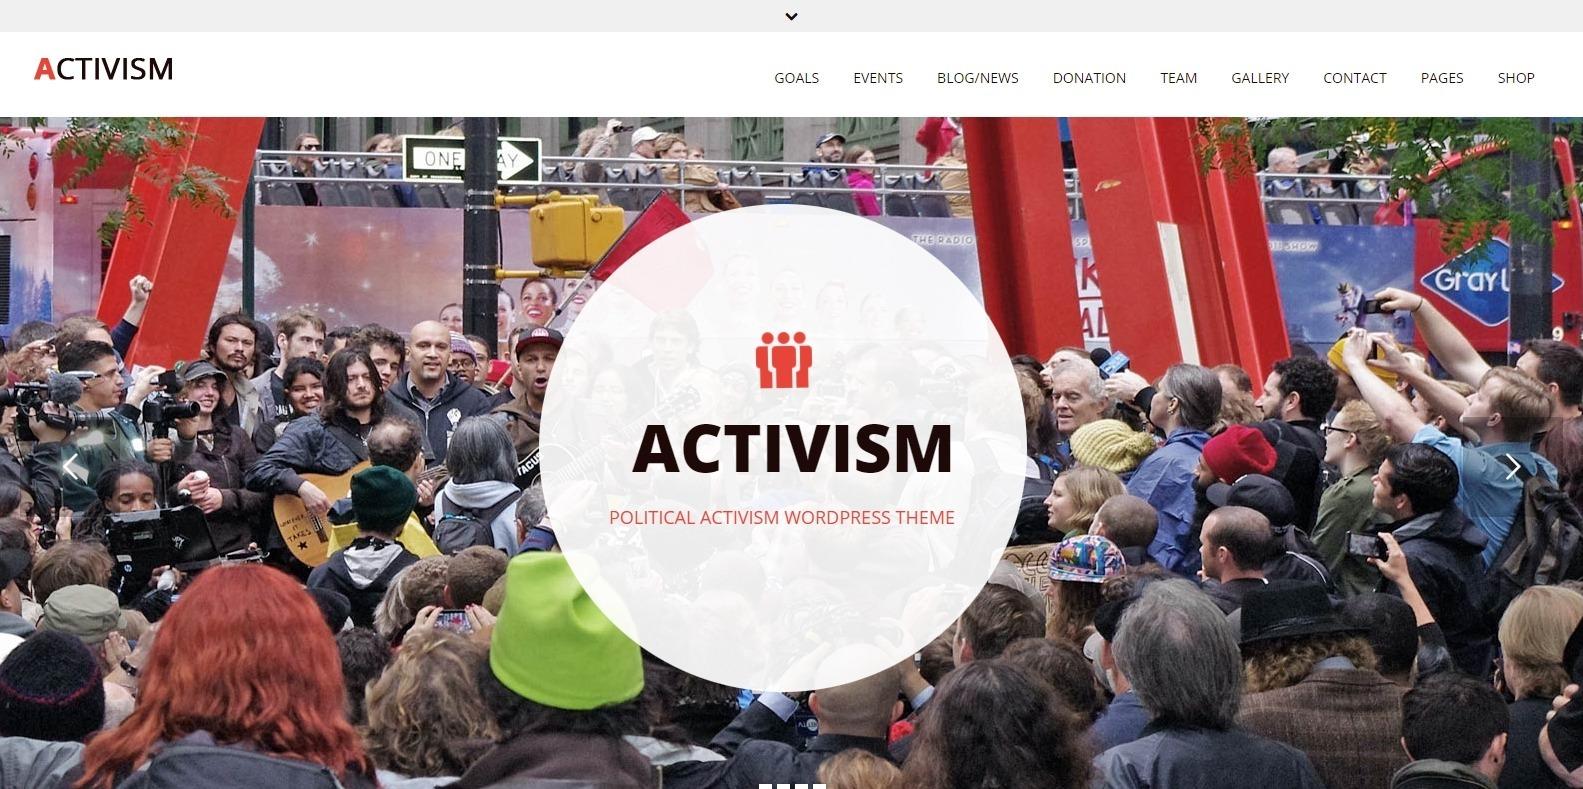 activism-political-website-template